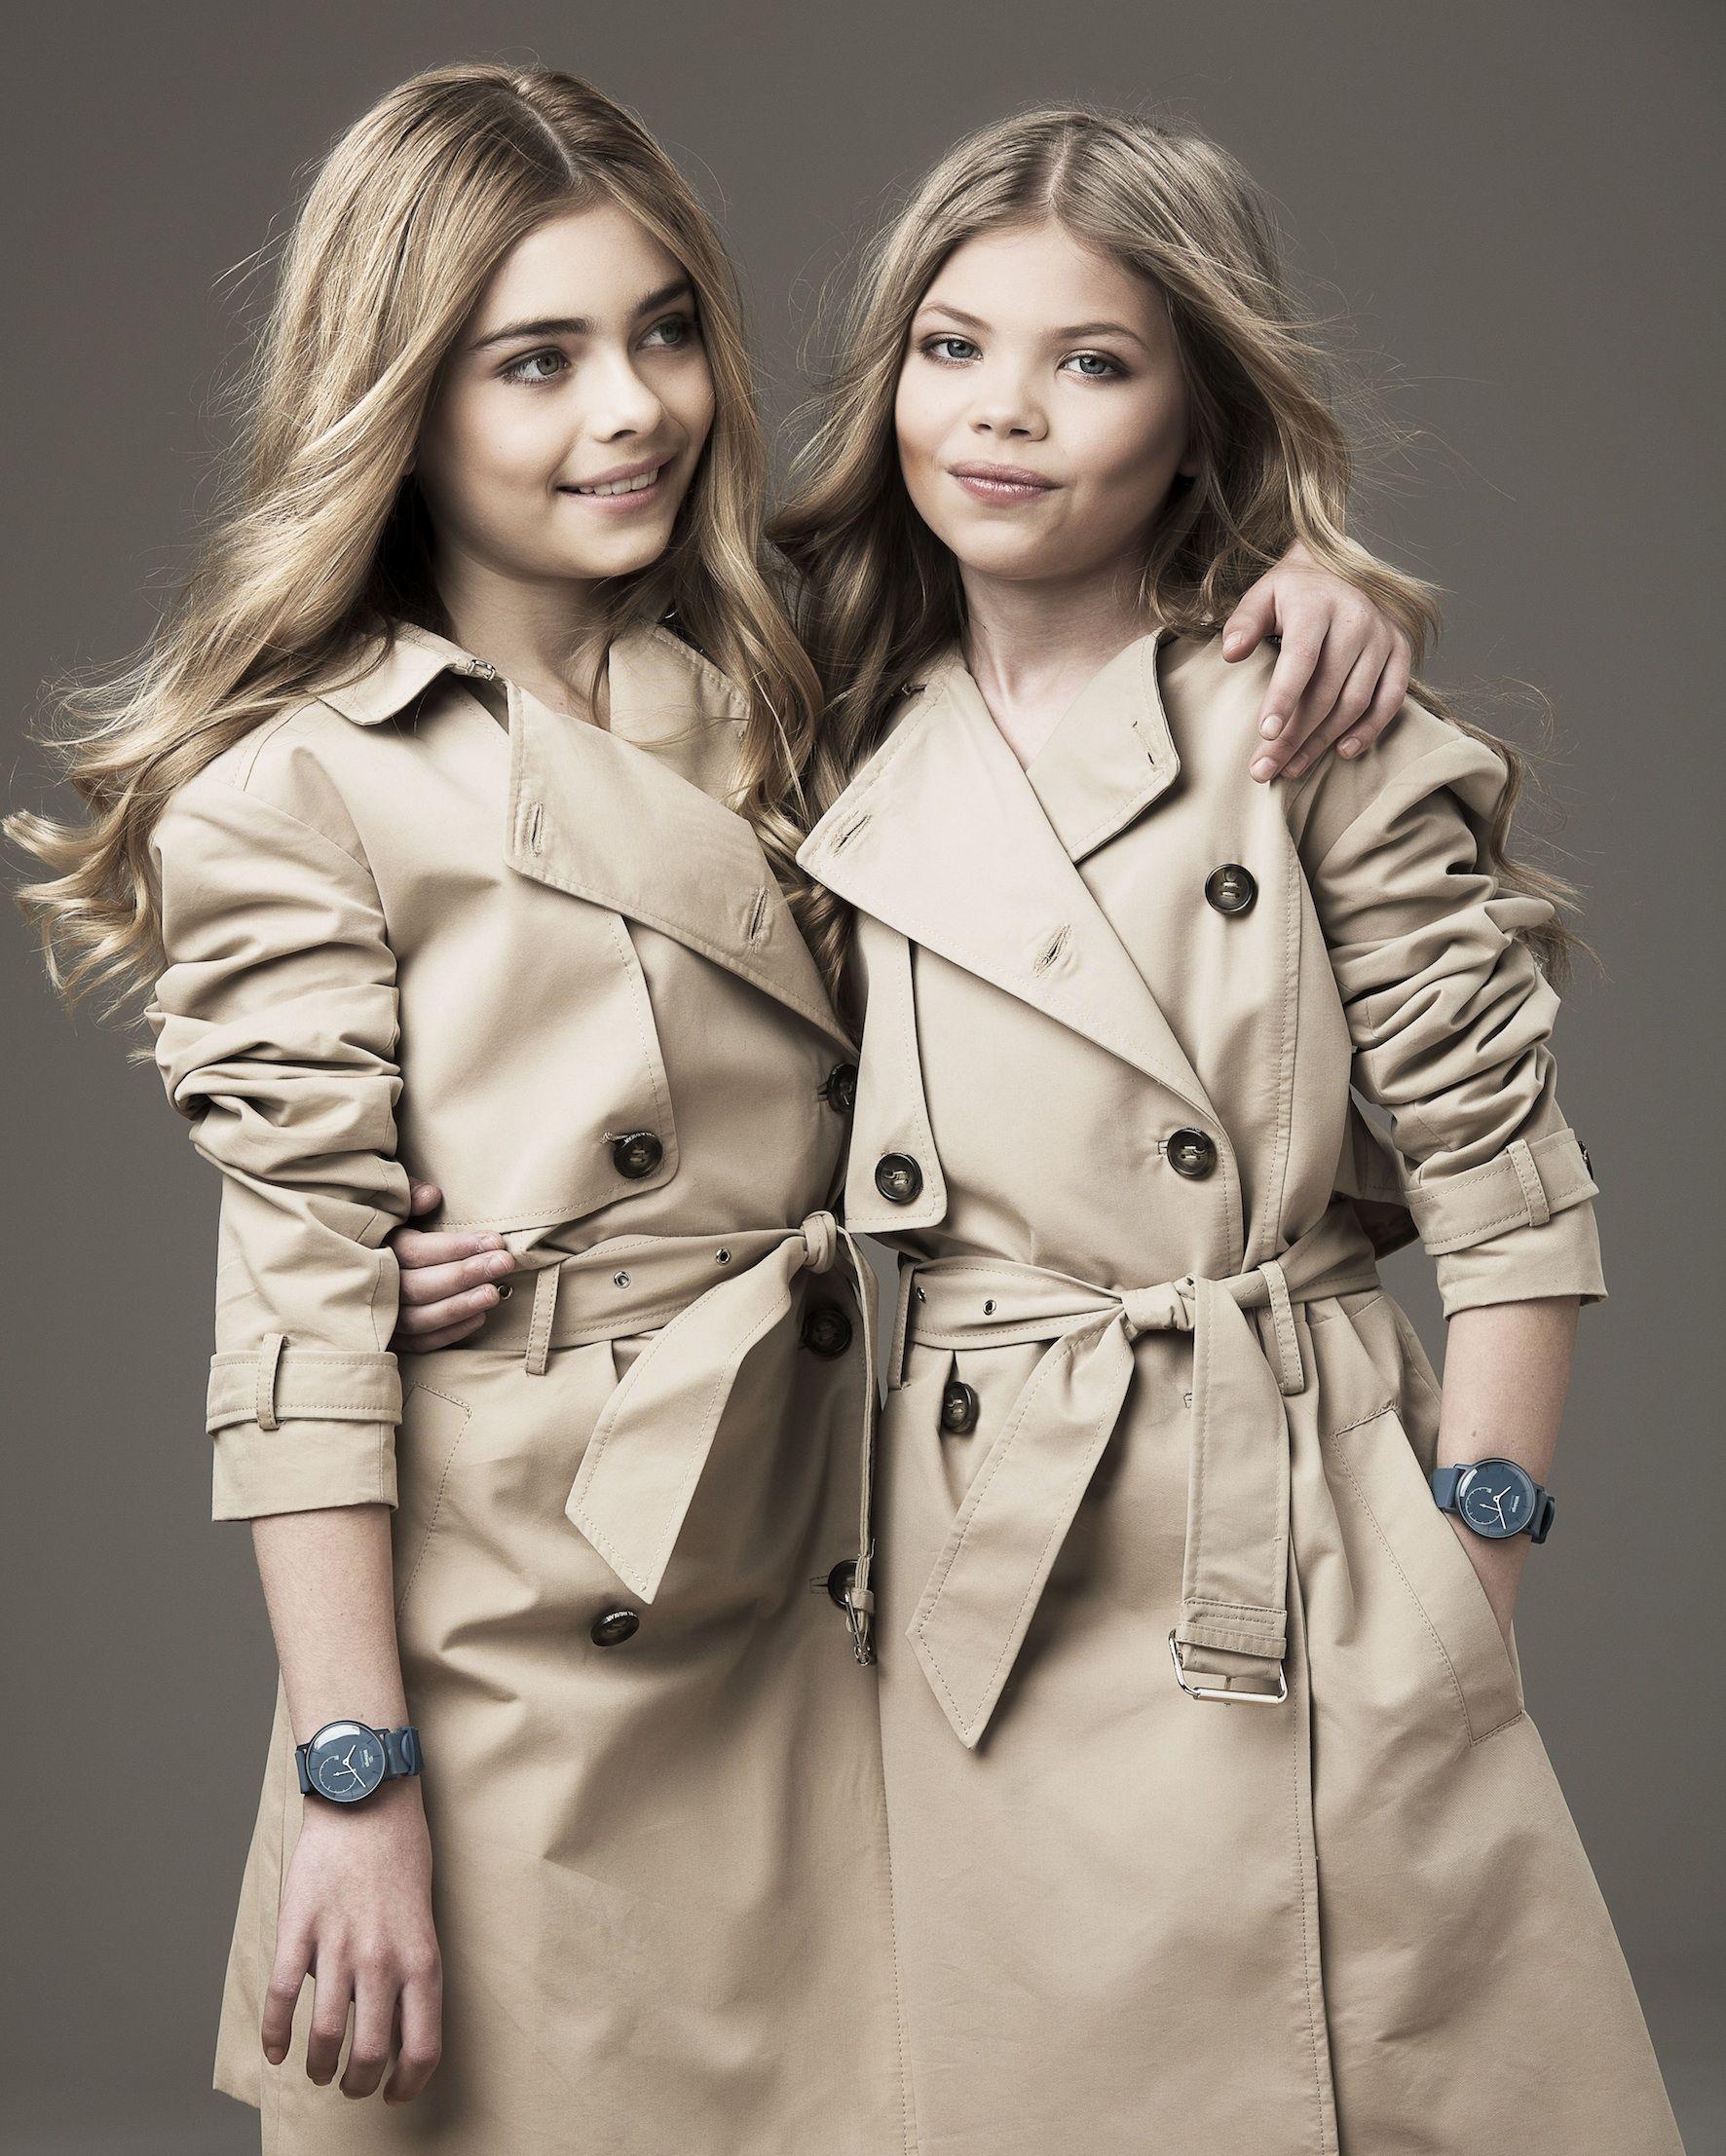 f93da5e2b787 Models Kate Moss and Cara Delevingne have a mini-me makeover